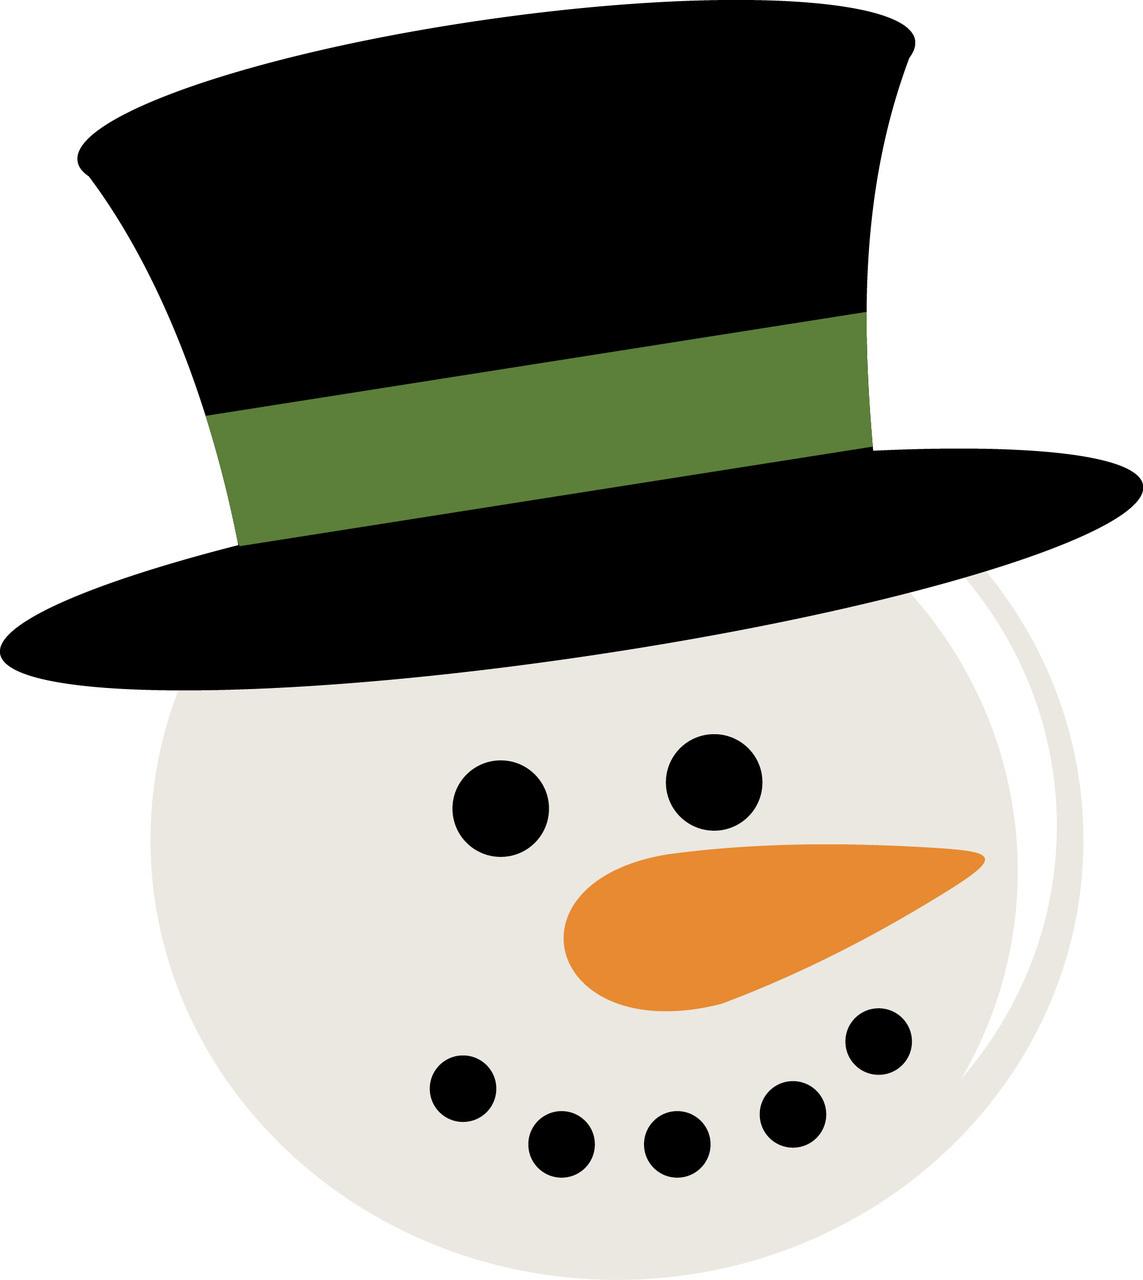 Best Images of Snowman Head Printable - Free Printable Snowman ...